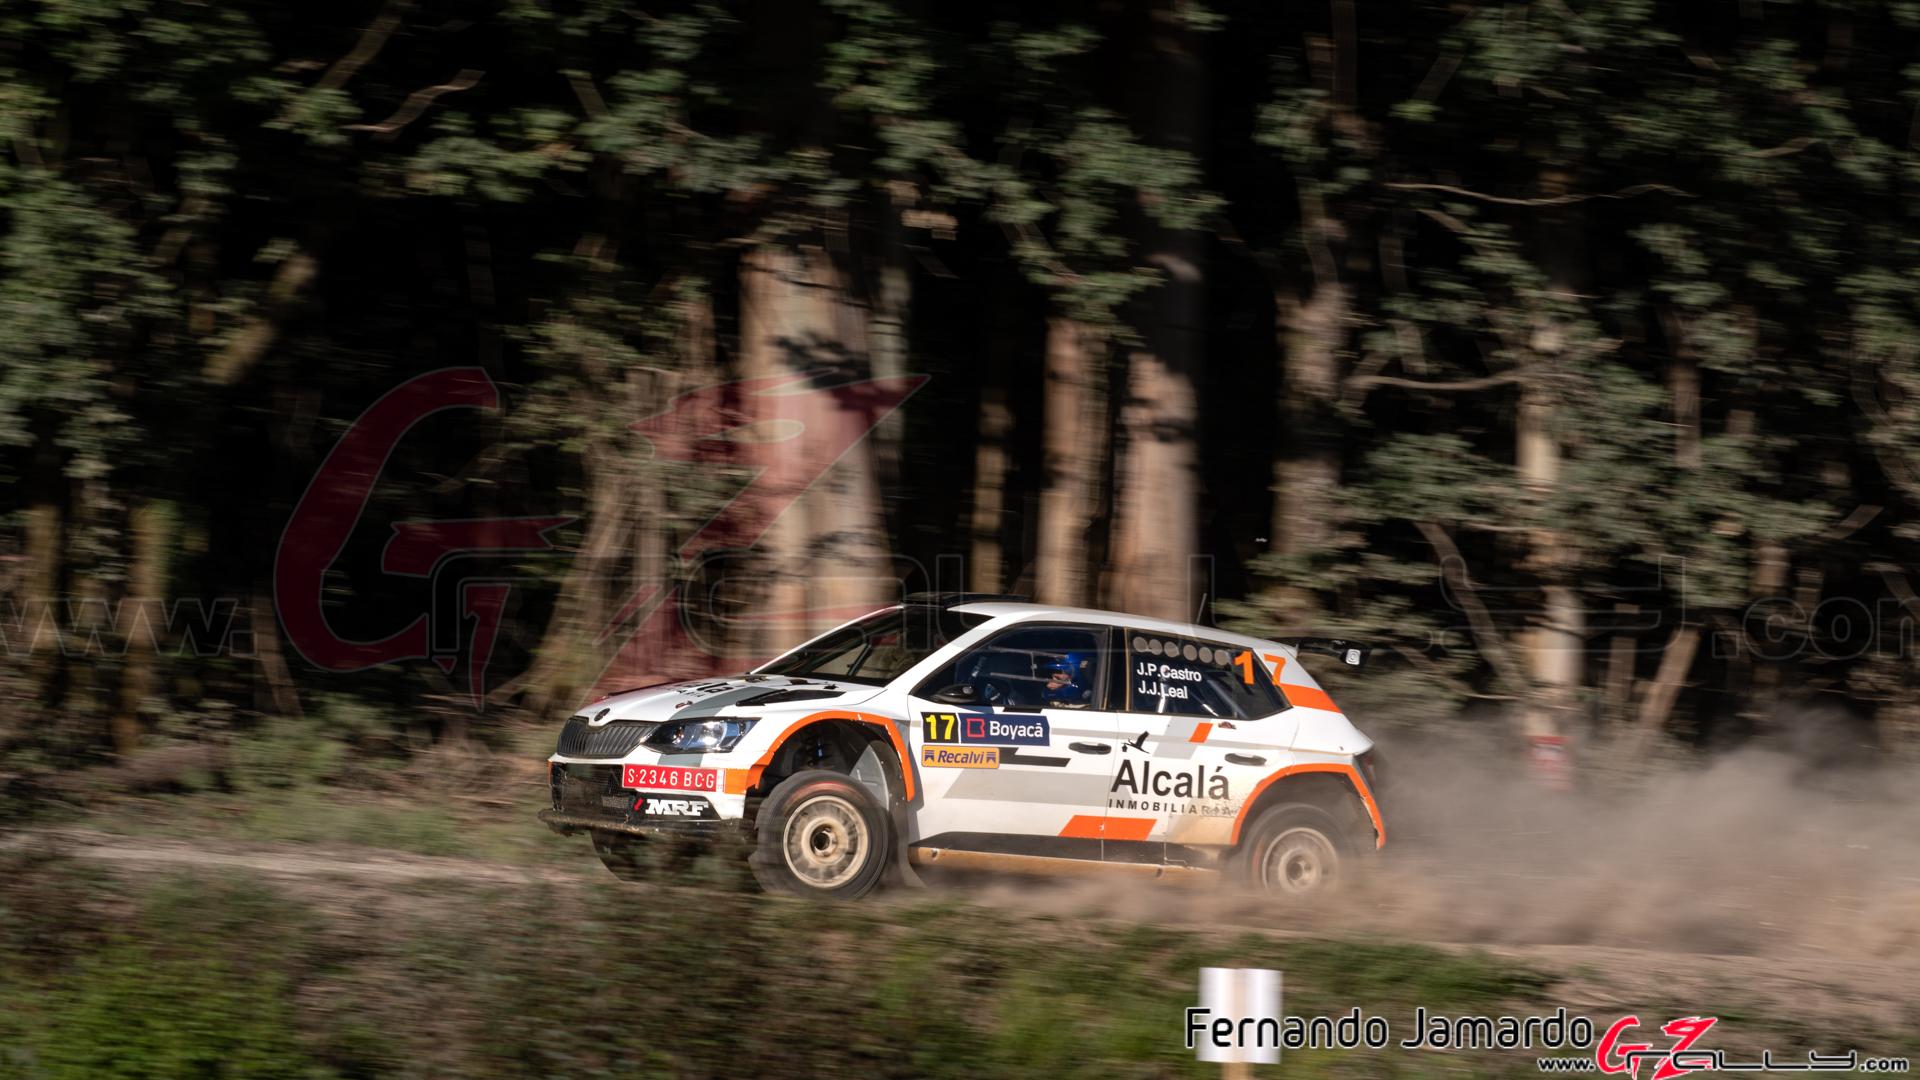 Rally da Auga 2021 - Fernando Jamardo